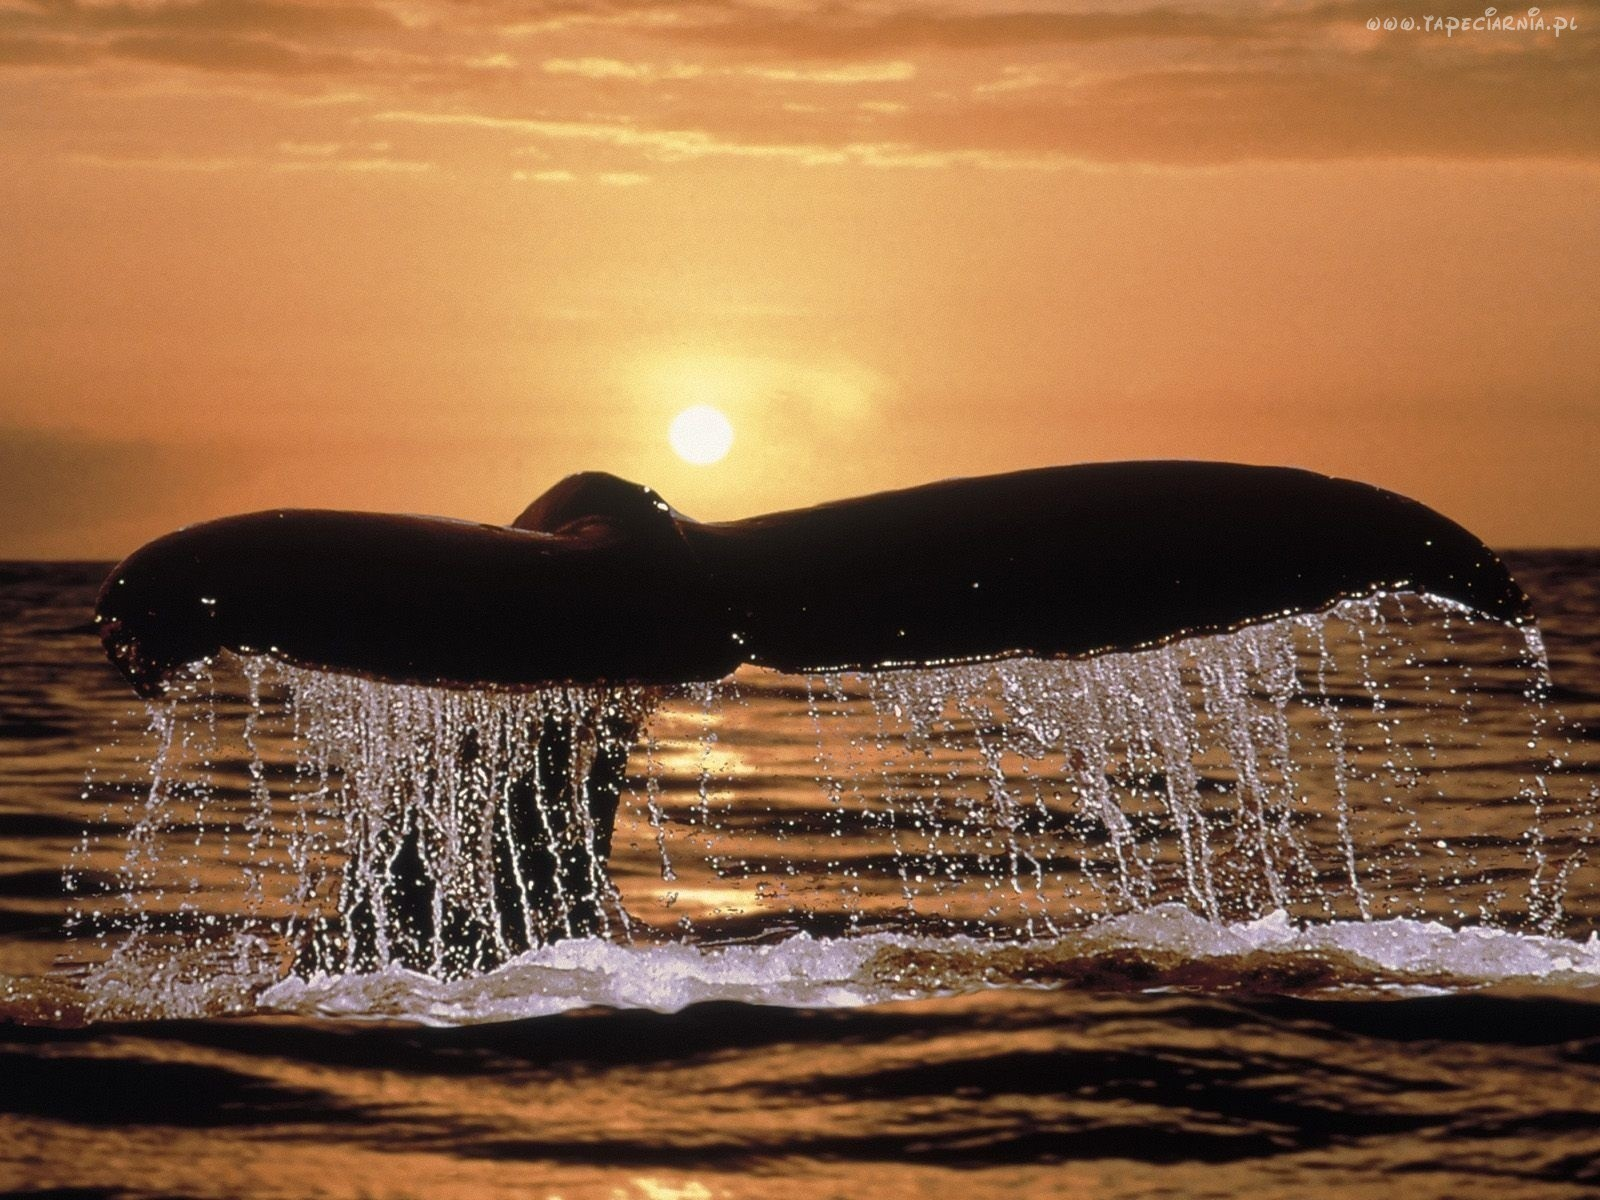 pletwa wieloryba